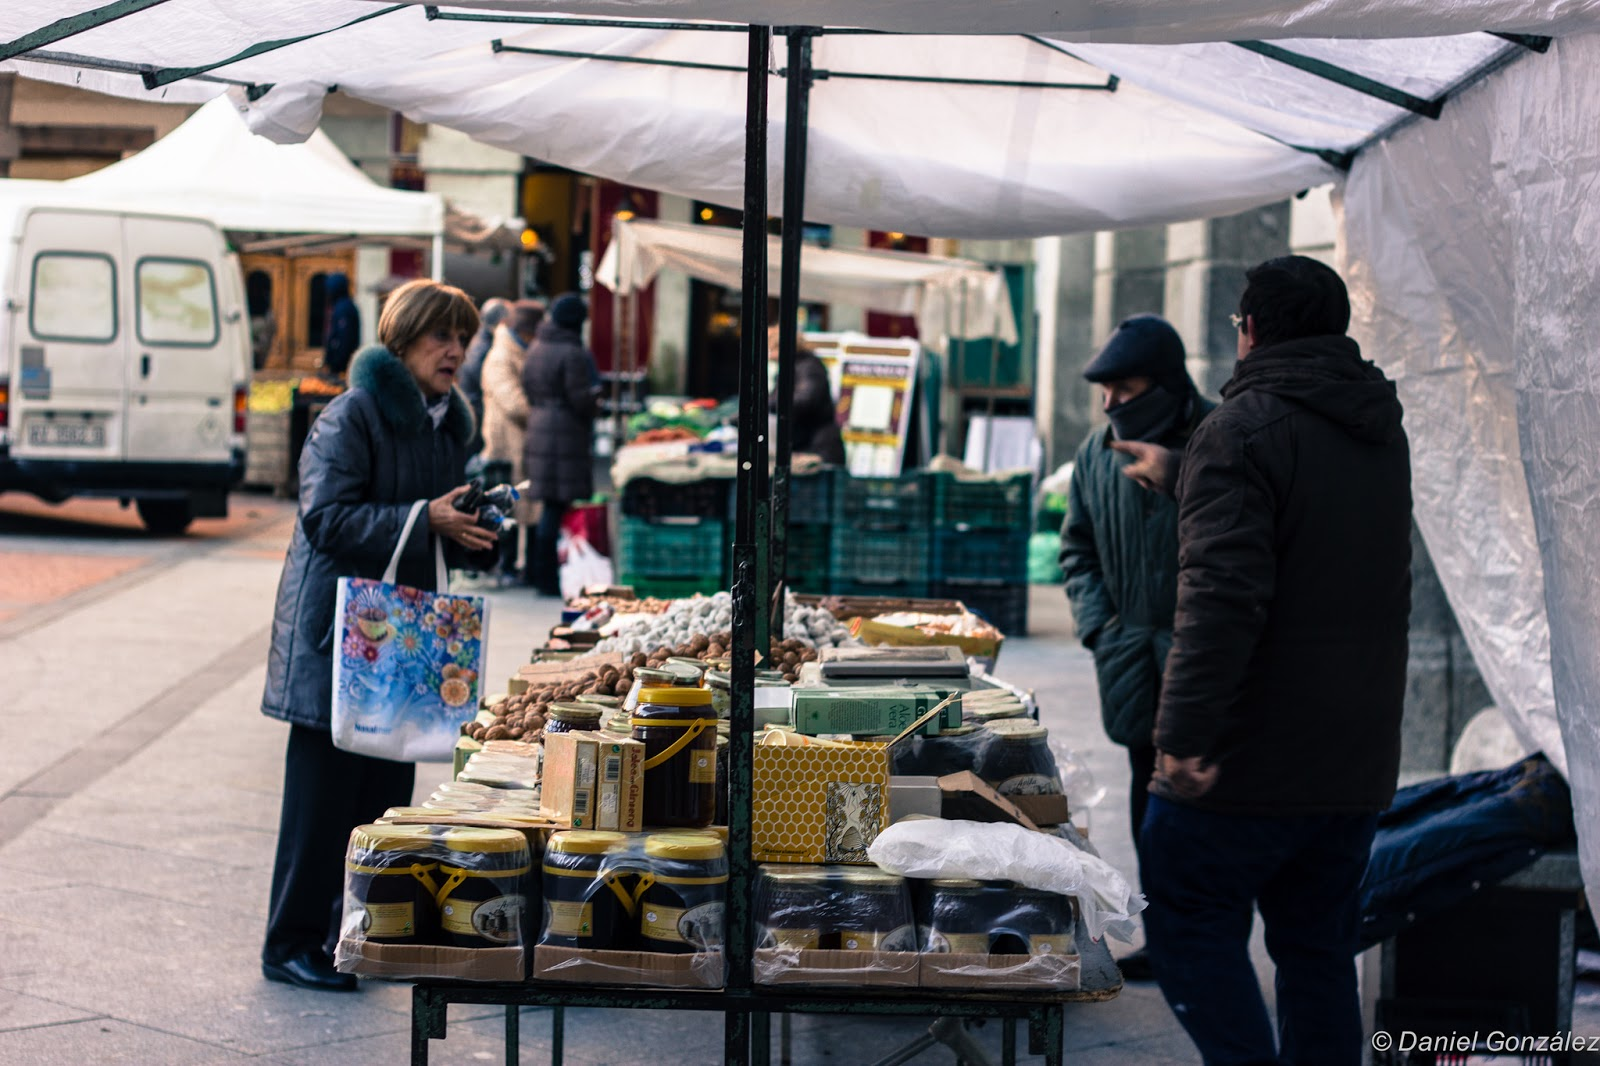 Mujer regateando, Mercado Chico, Avila 2014